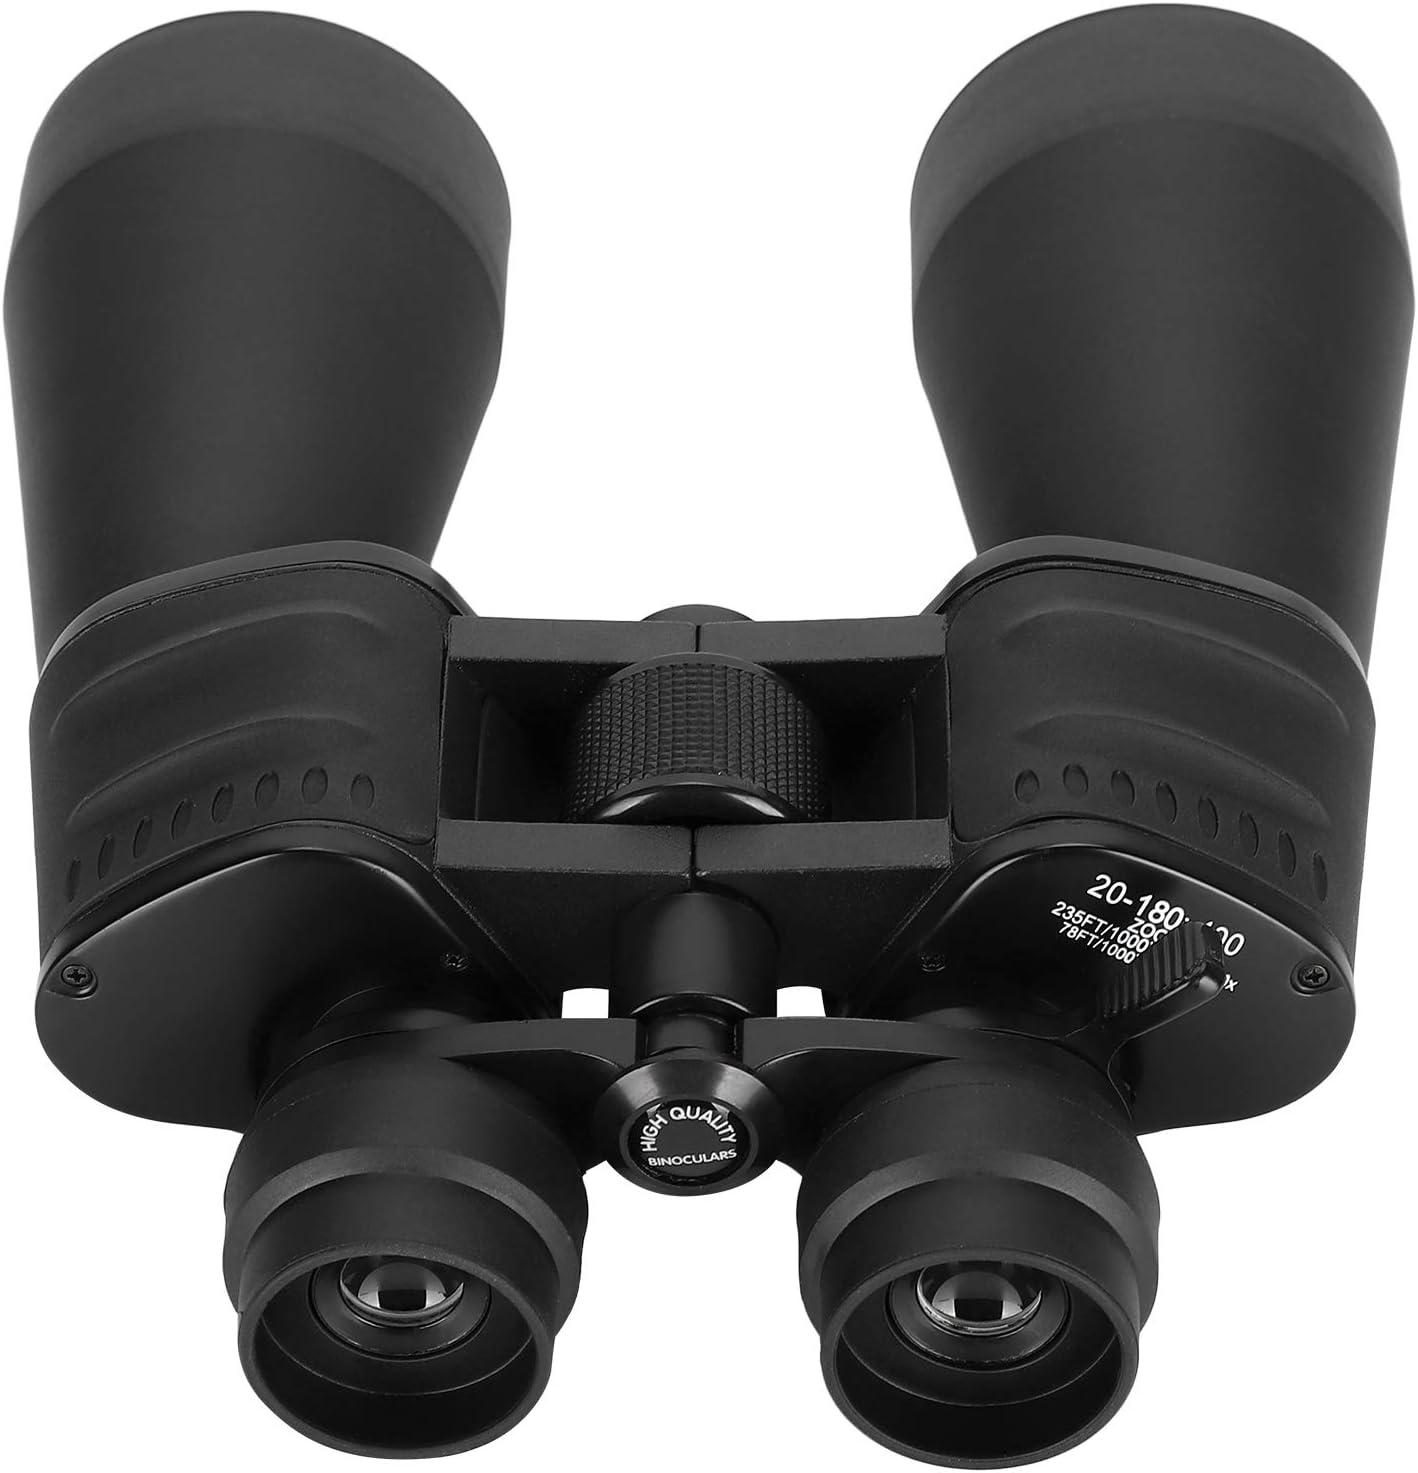 【𝐁𝐥𝐚𝐜𝐤 𝐅𝐫𝐢𝐝𝐚𝒚 𝐒𝐚𝐥𝐞】 Escalada 20‑180x100 telescopio Binocular para Exteriores para Adultos, para Viajes, observación de Aves, conciertos, Caza, Deportes al Aire Libre